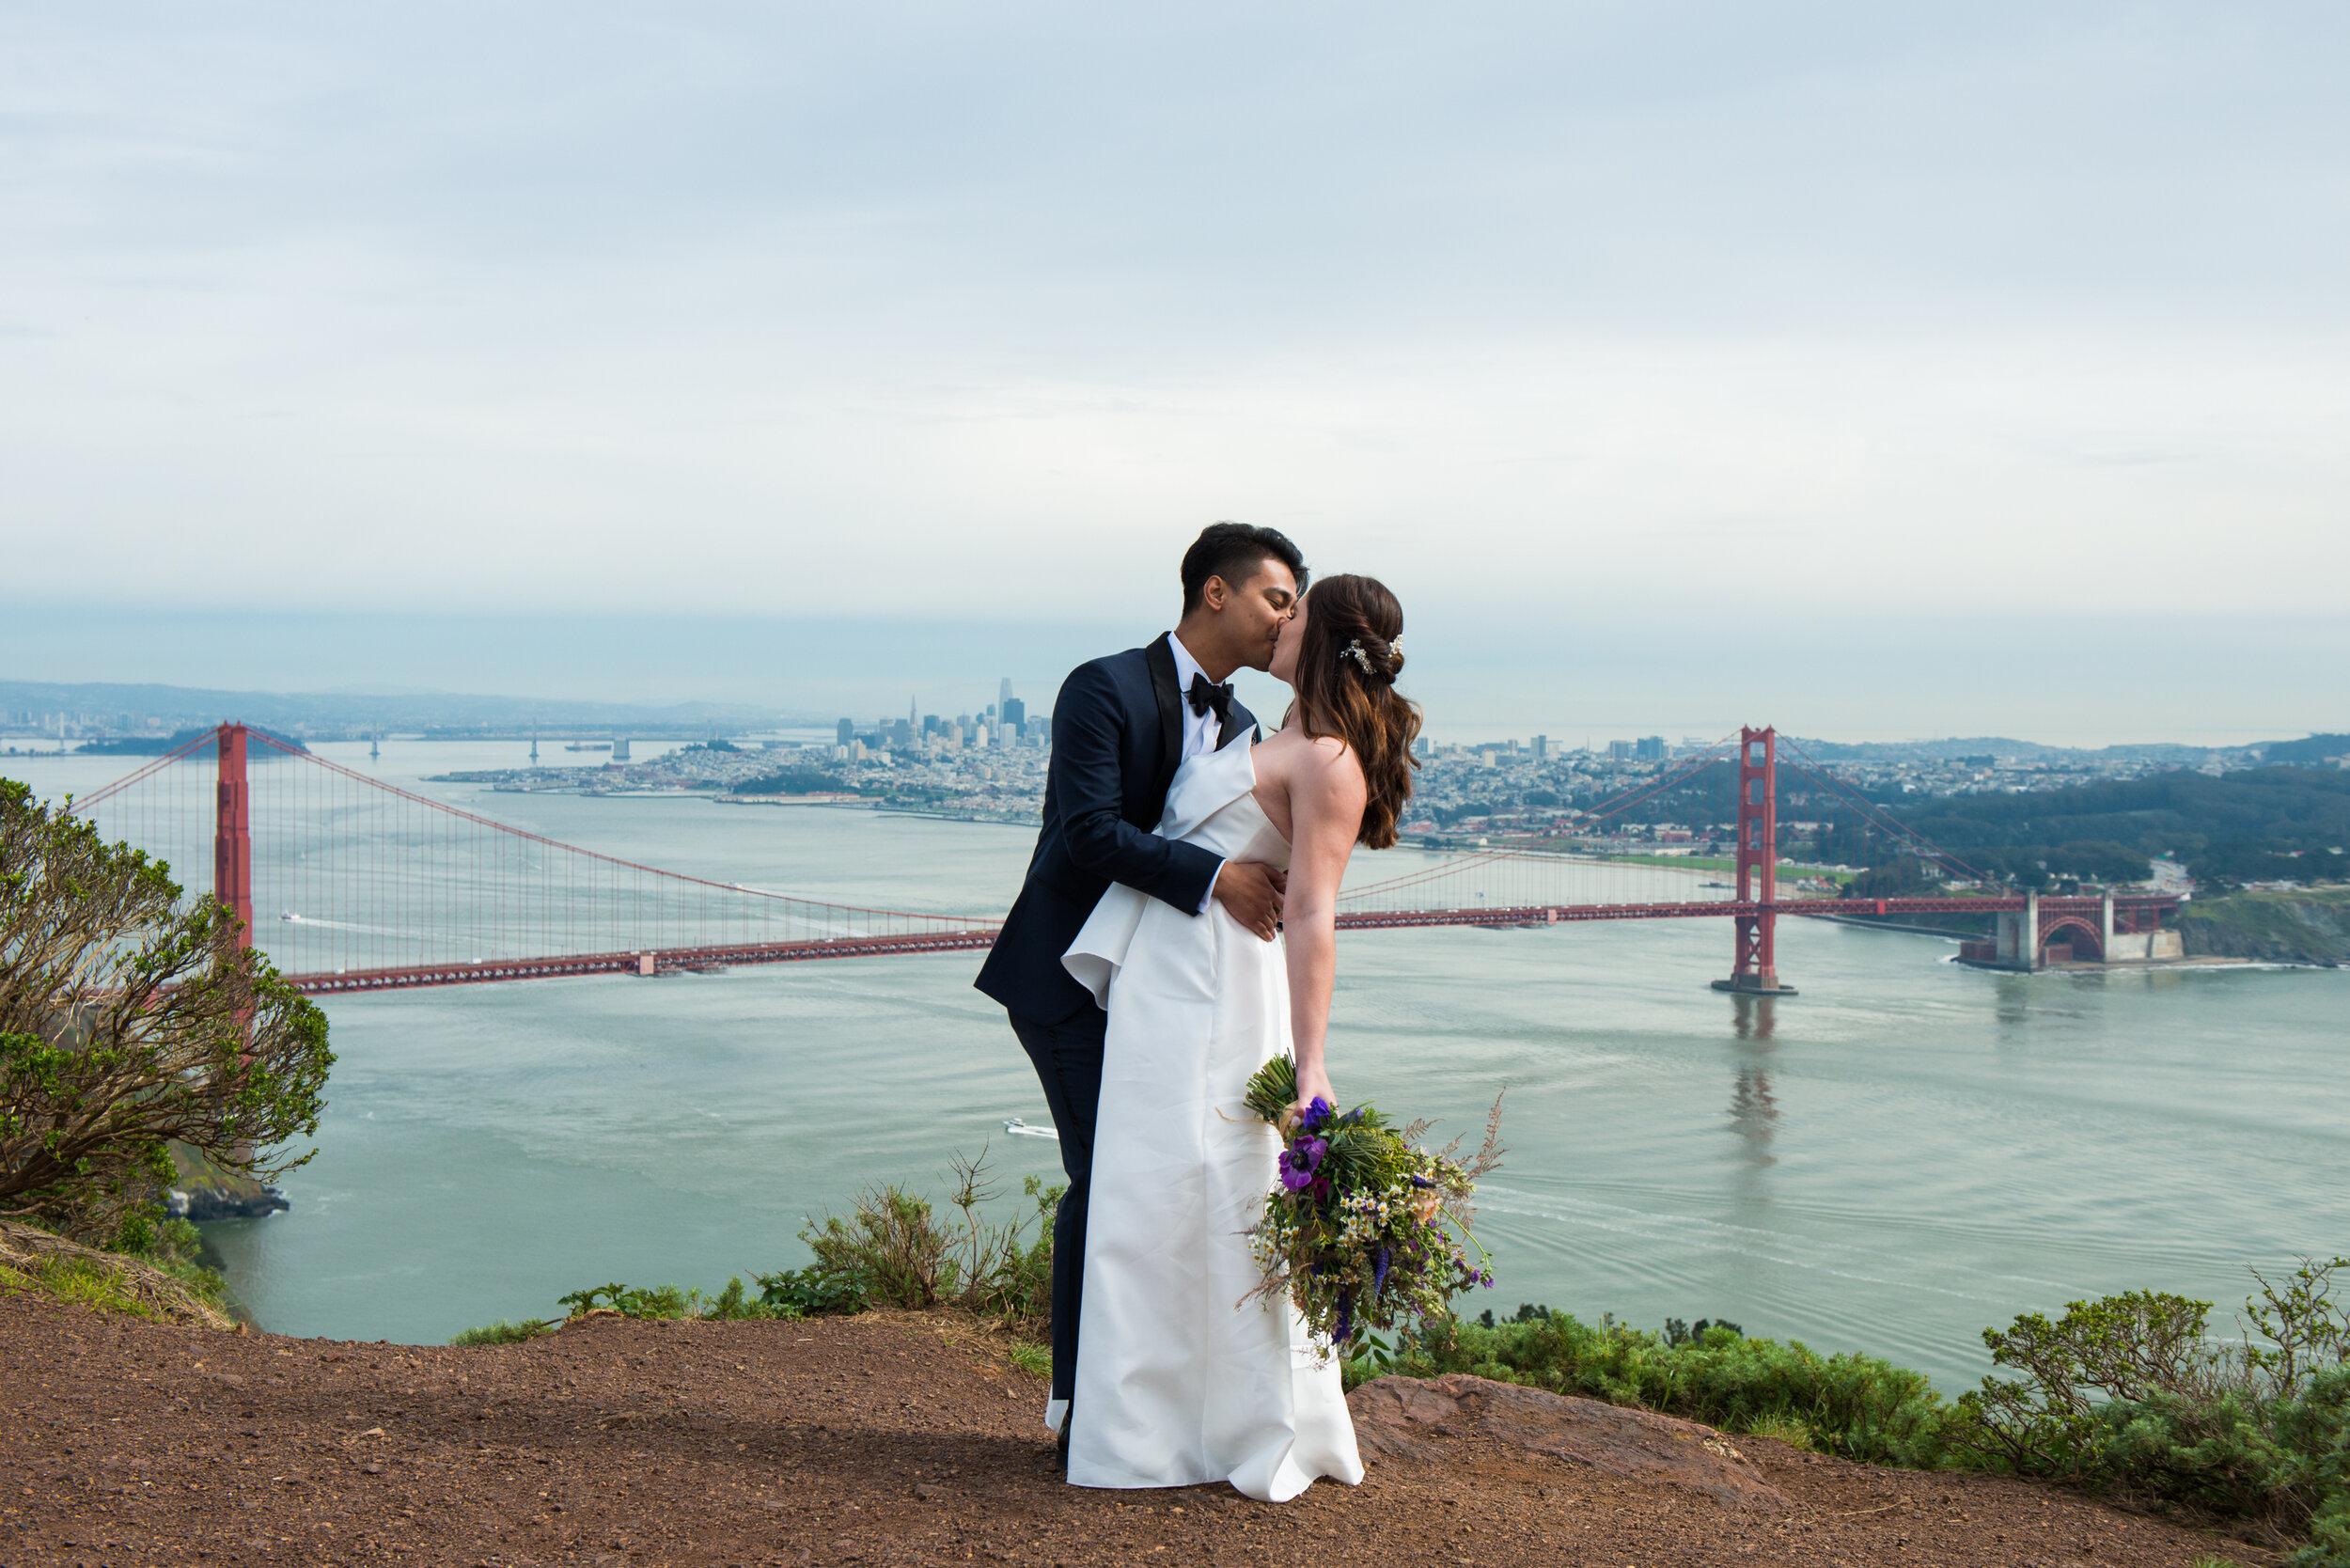 Golden Gate Wedding Photography23.jpg